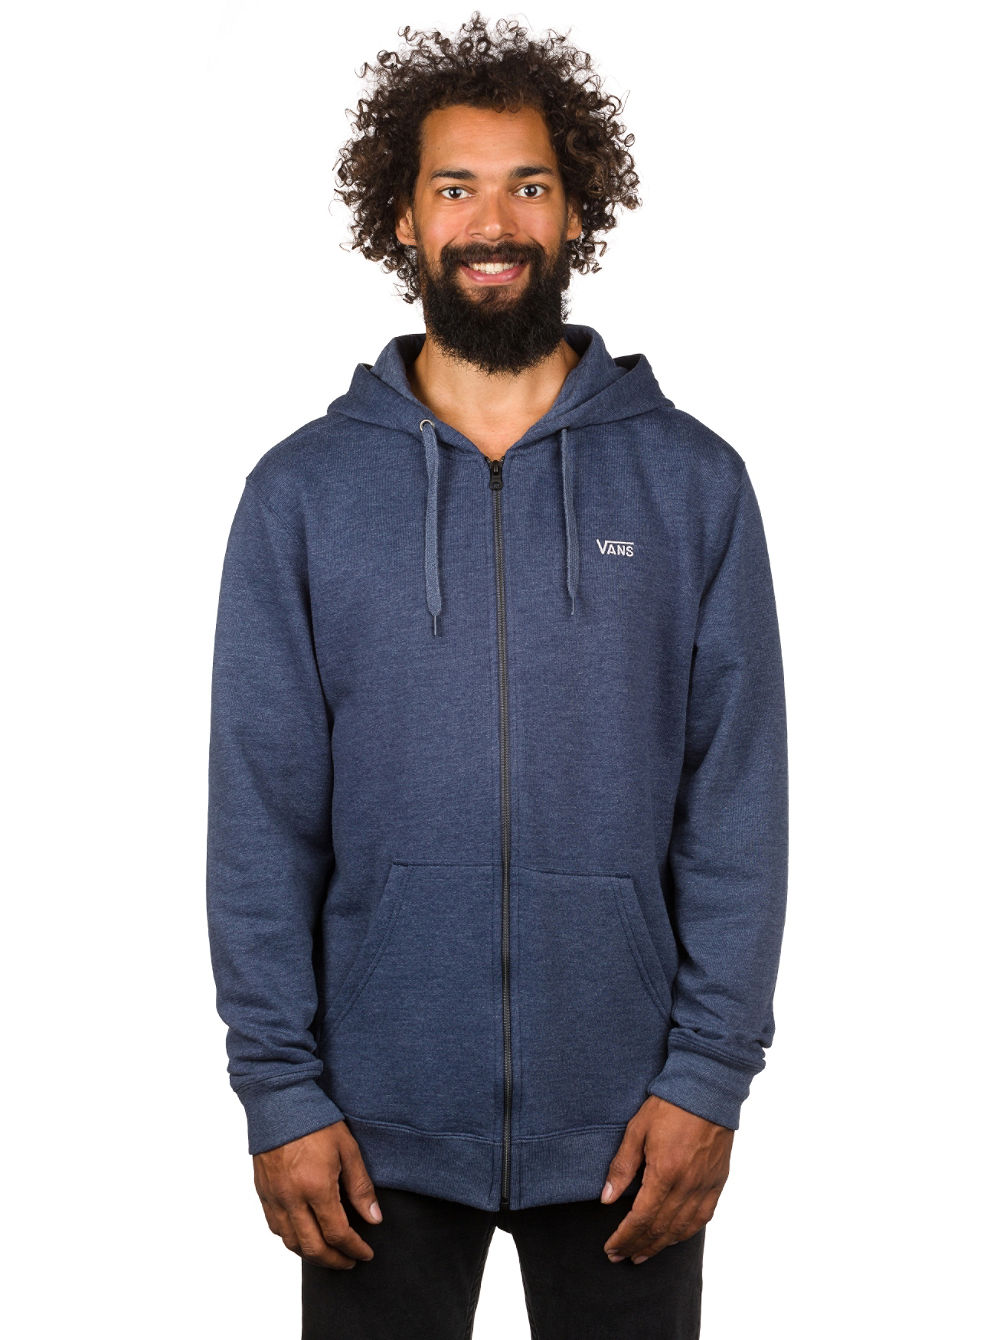 Ucsd hoodies